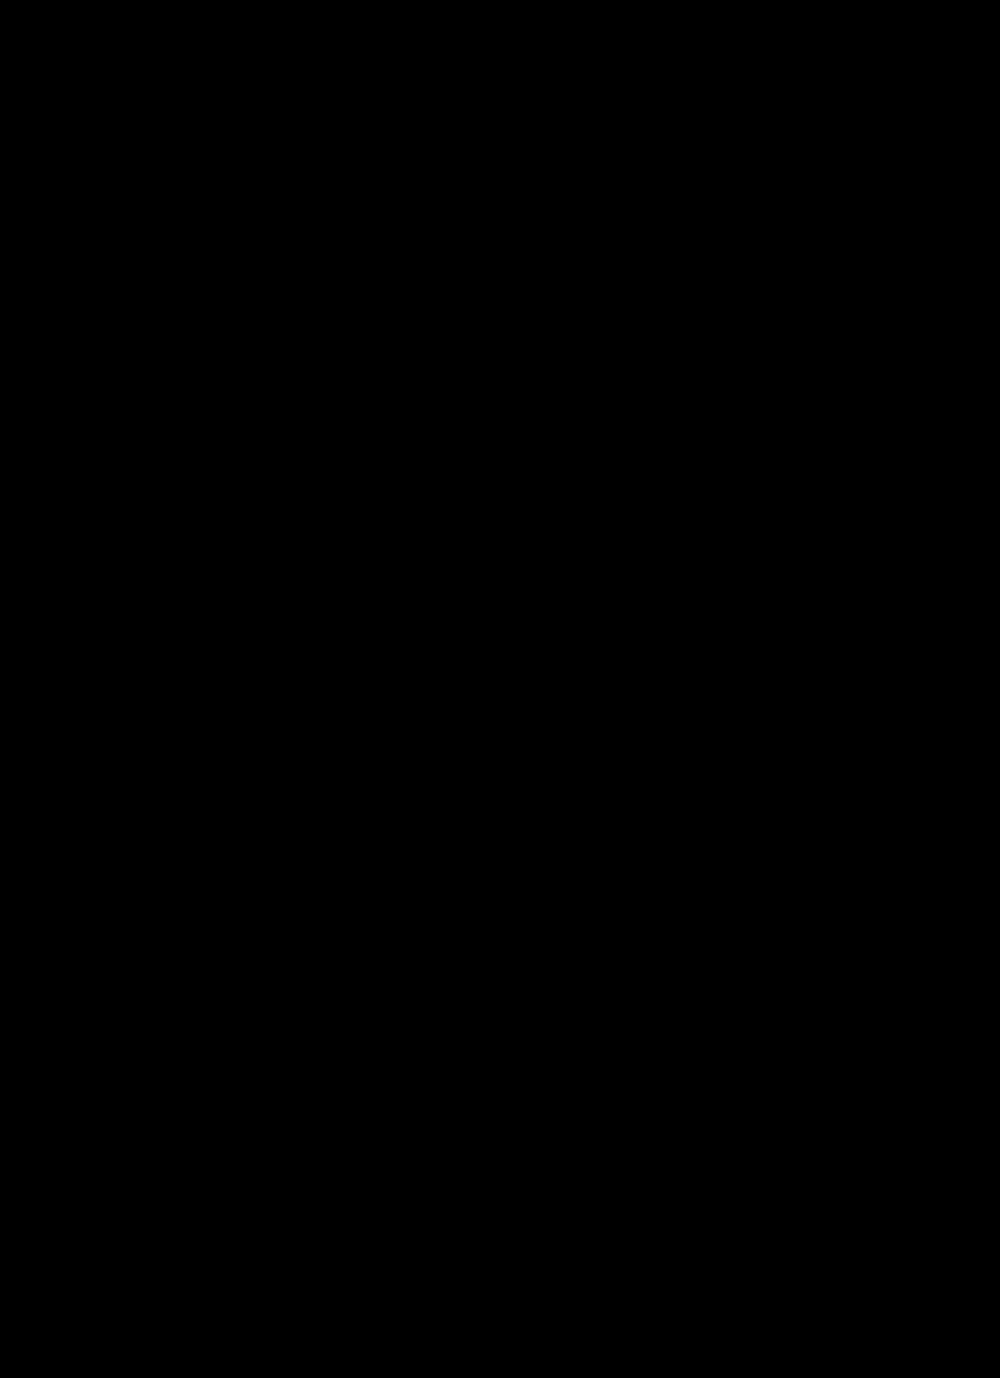 logo_colaborativa.pe_.base_Transp.png